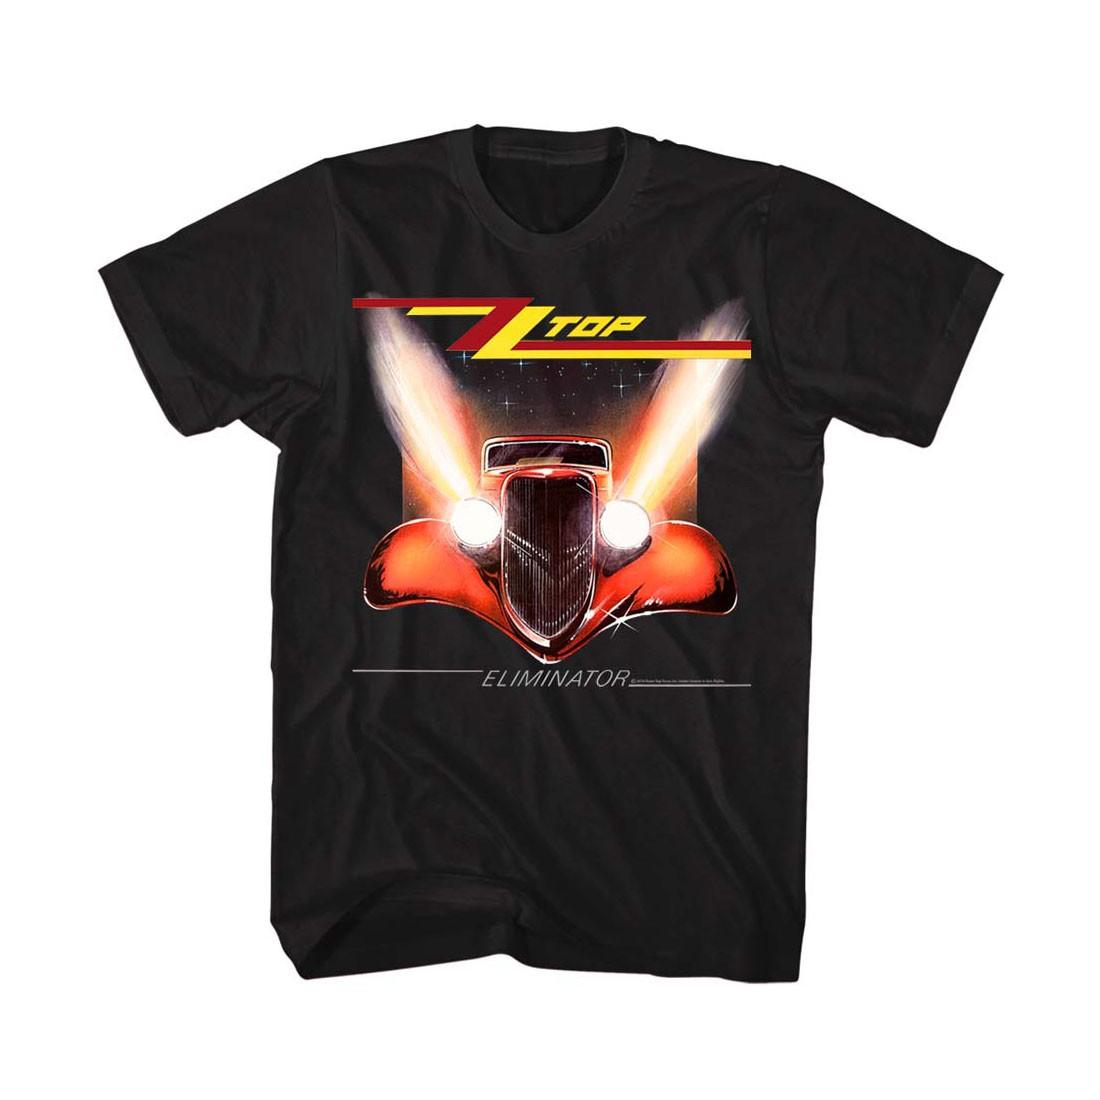 ZZ Top Eliminator Cover T-Shirt